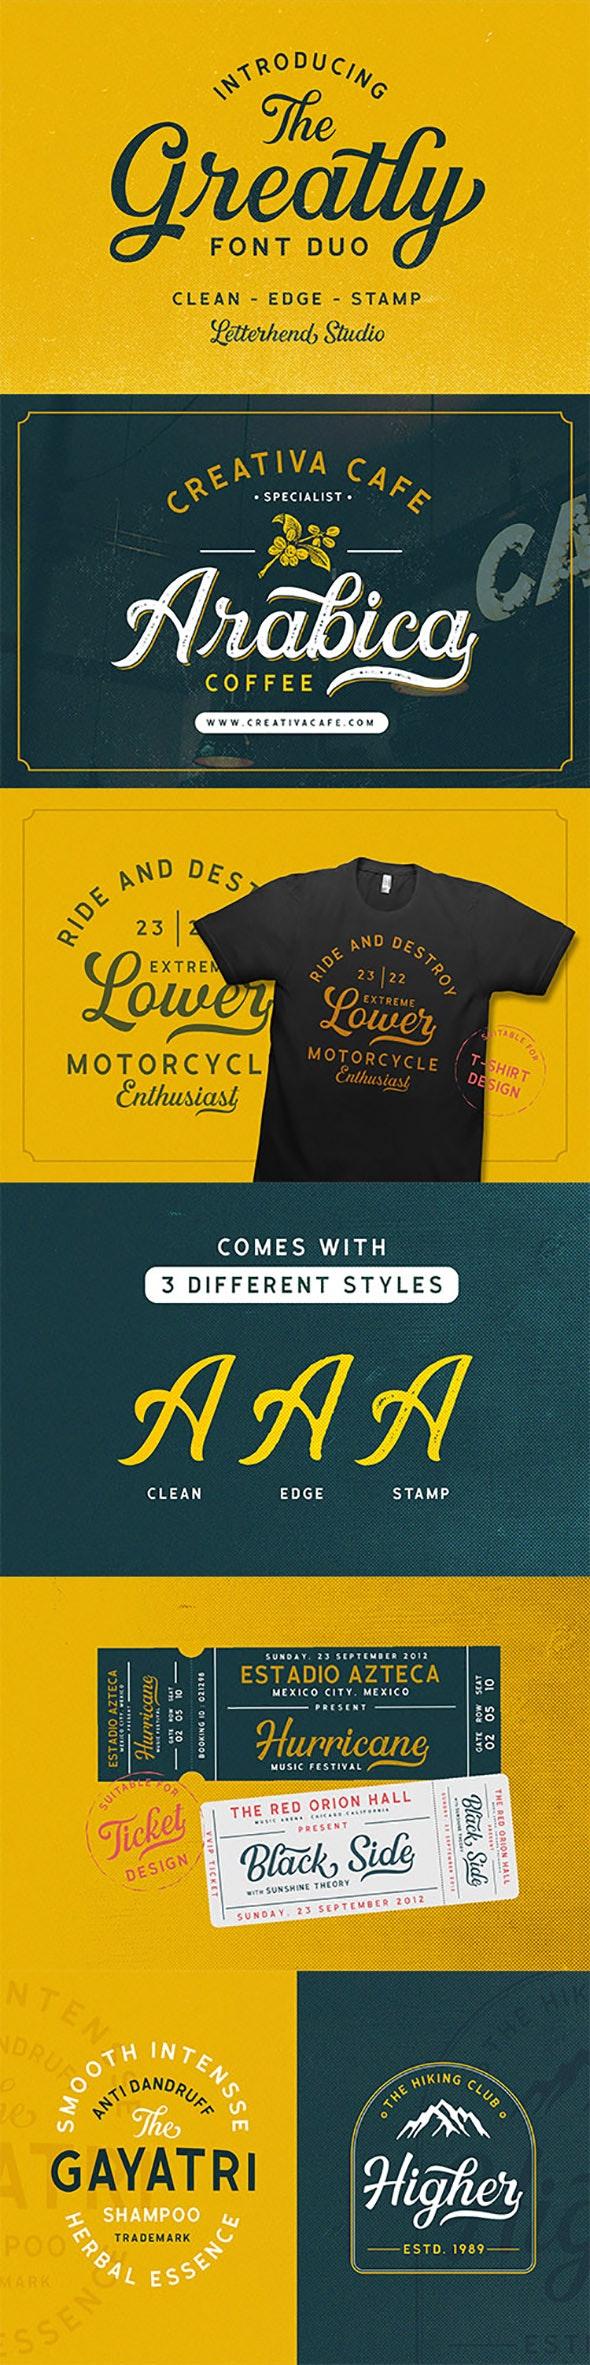 Greatly Font Duo + Logo Templates - Cursive Script